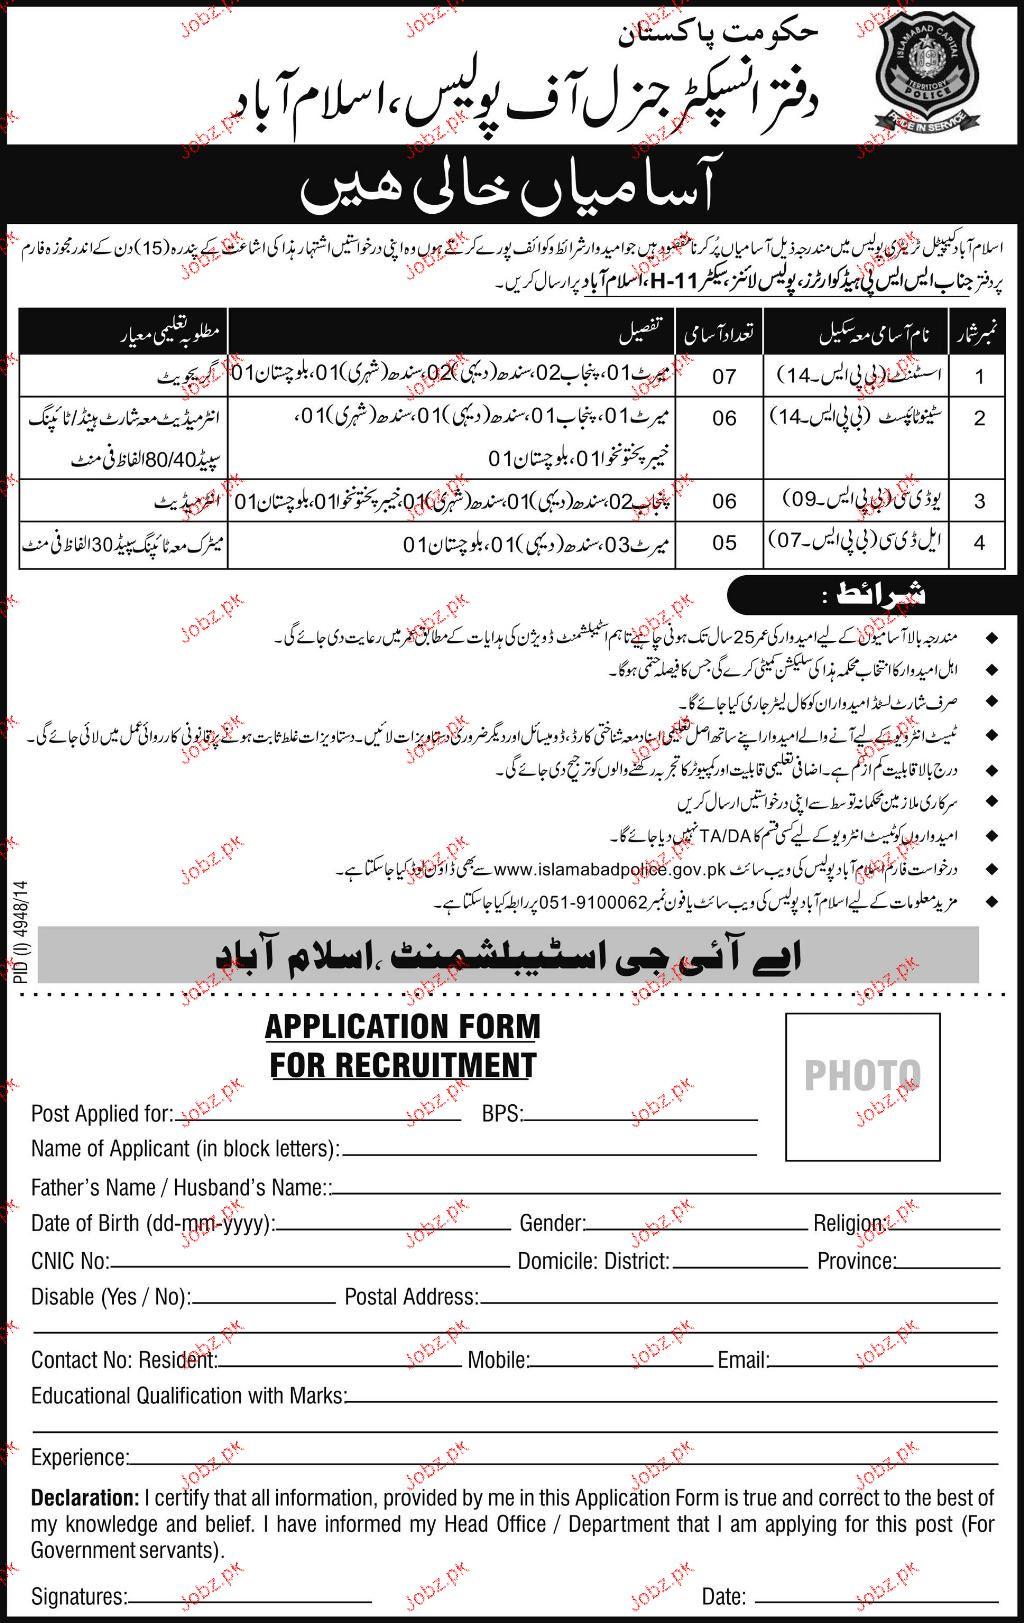 UDC, LDC, Stenotypist Job in Islamabad Police 2019 Job